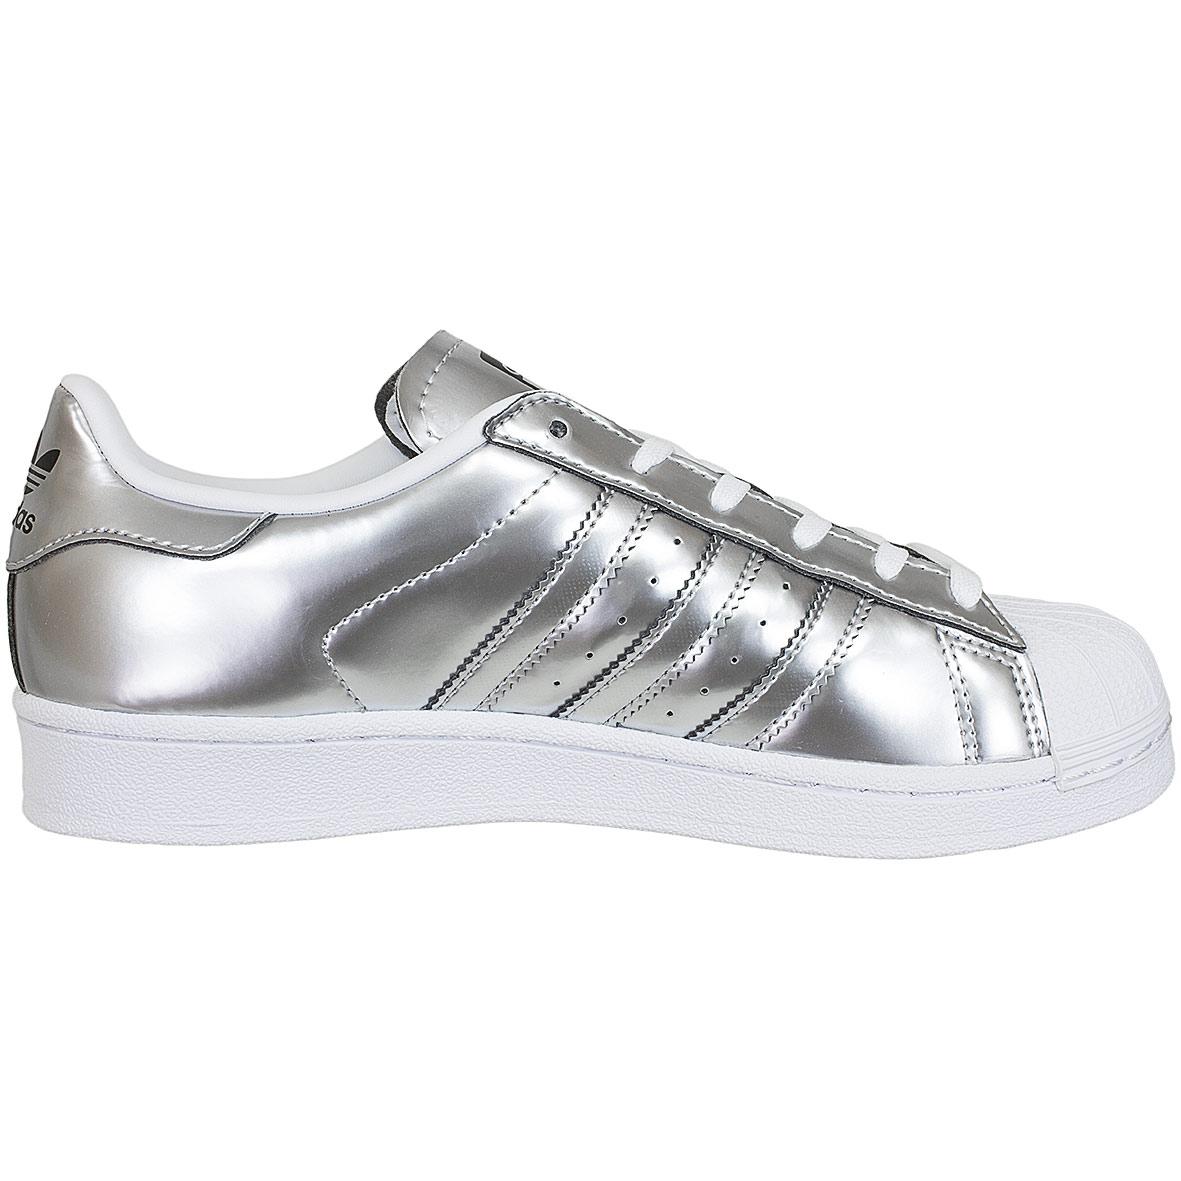 silberne adidas superstar